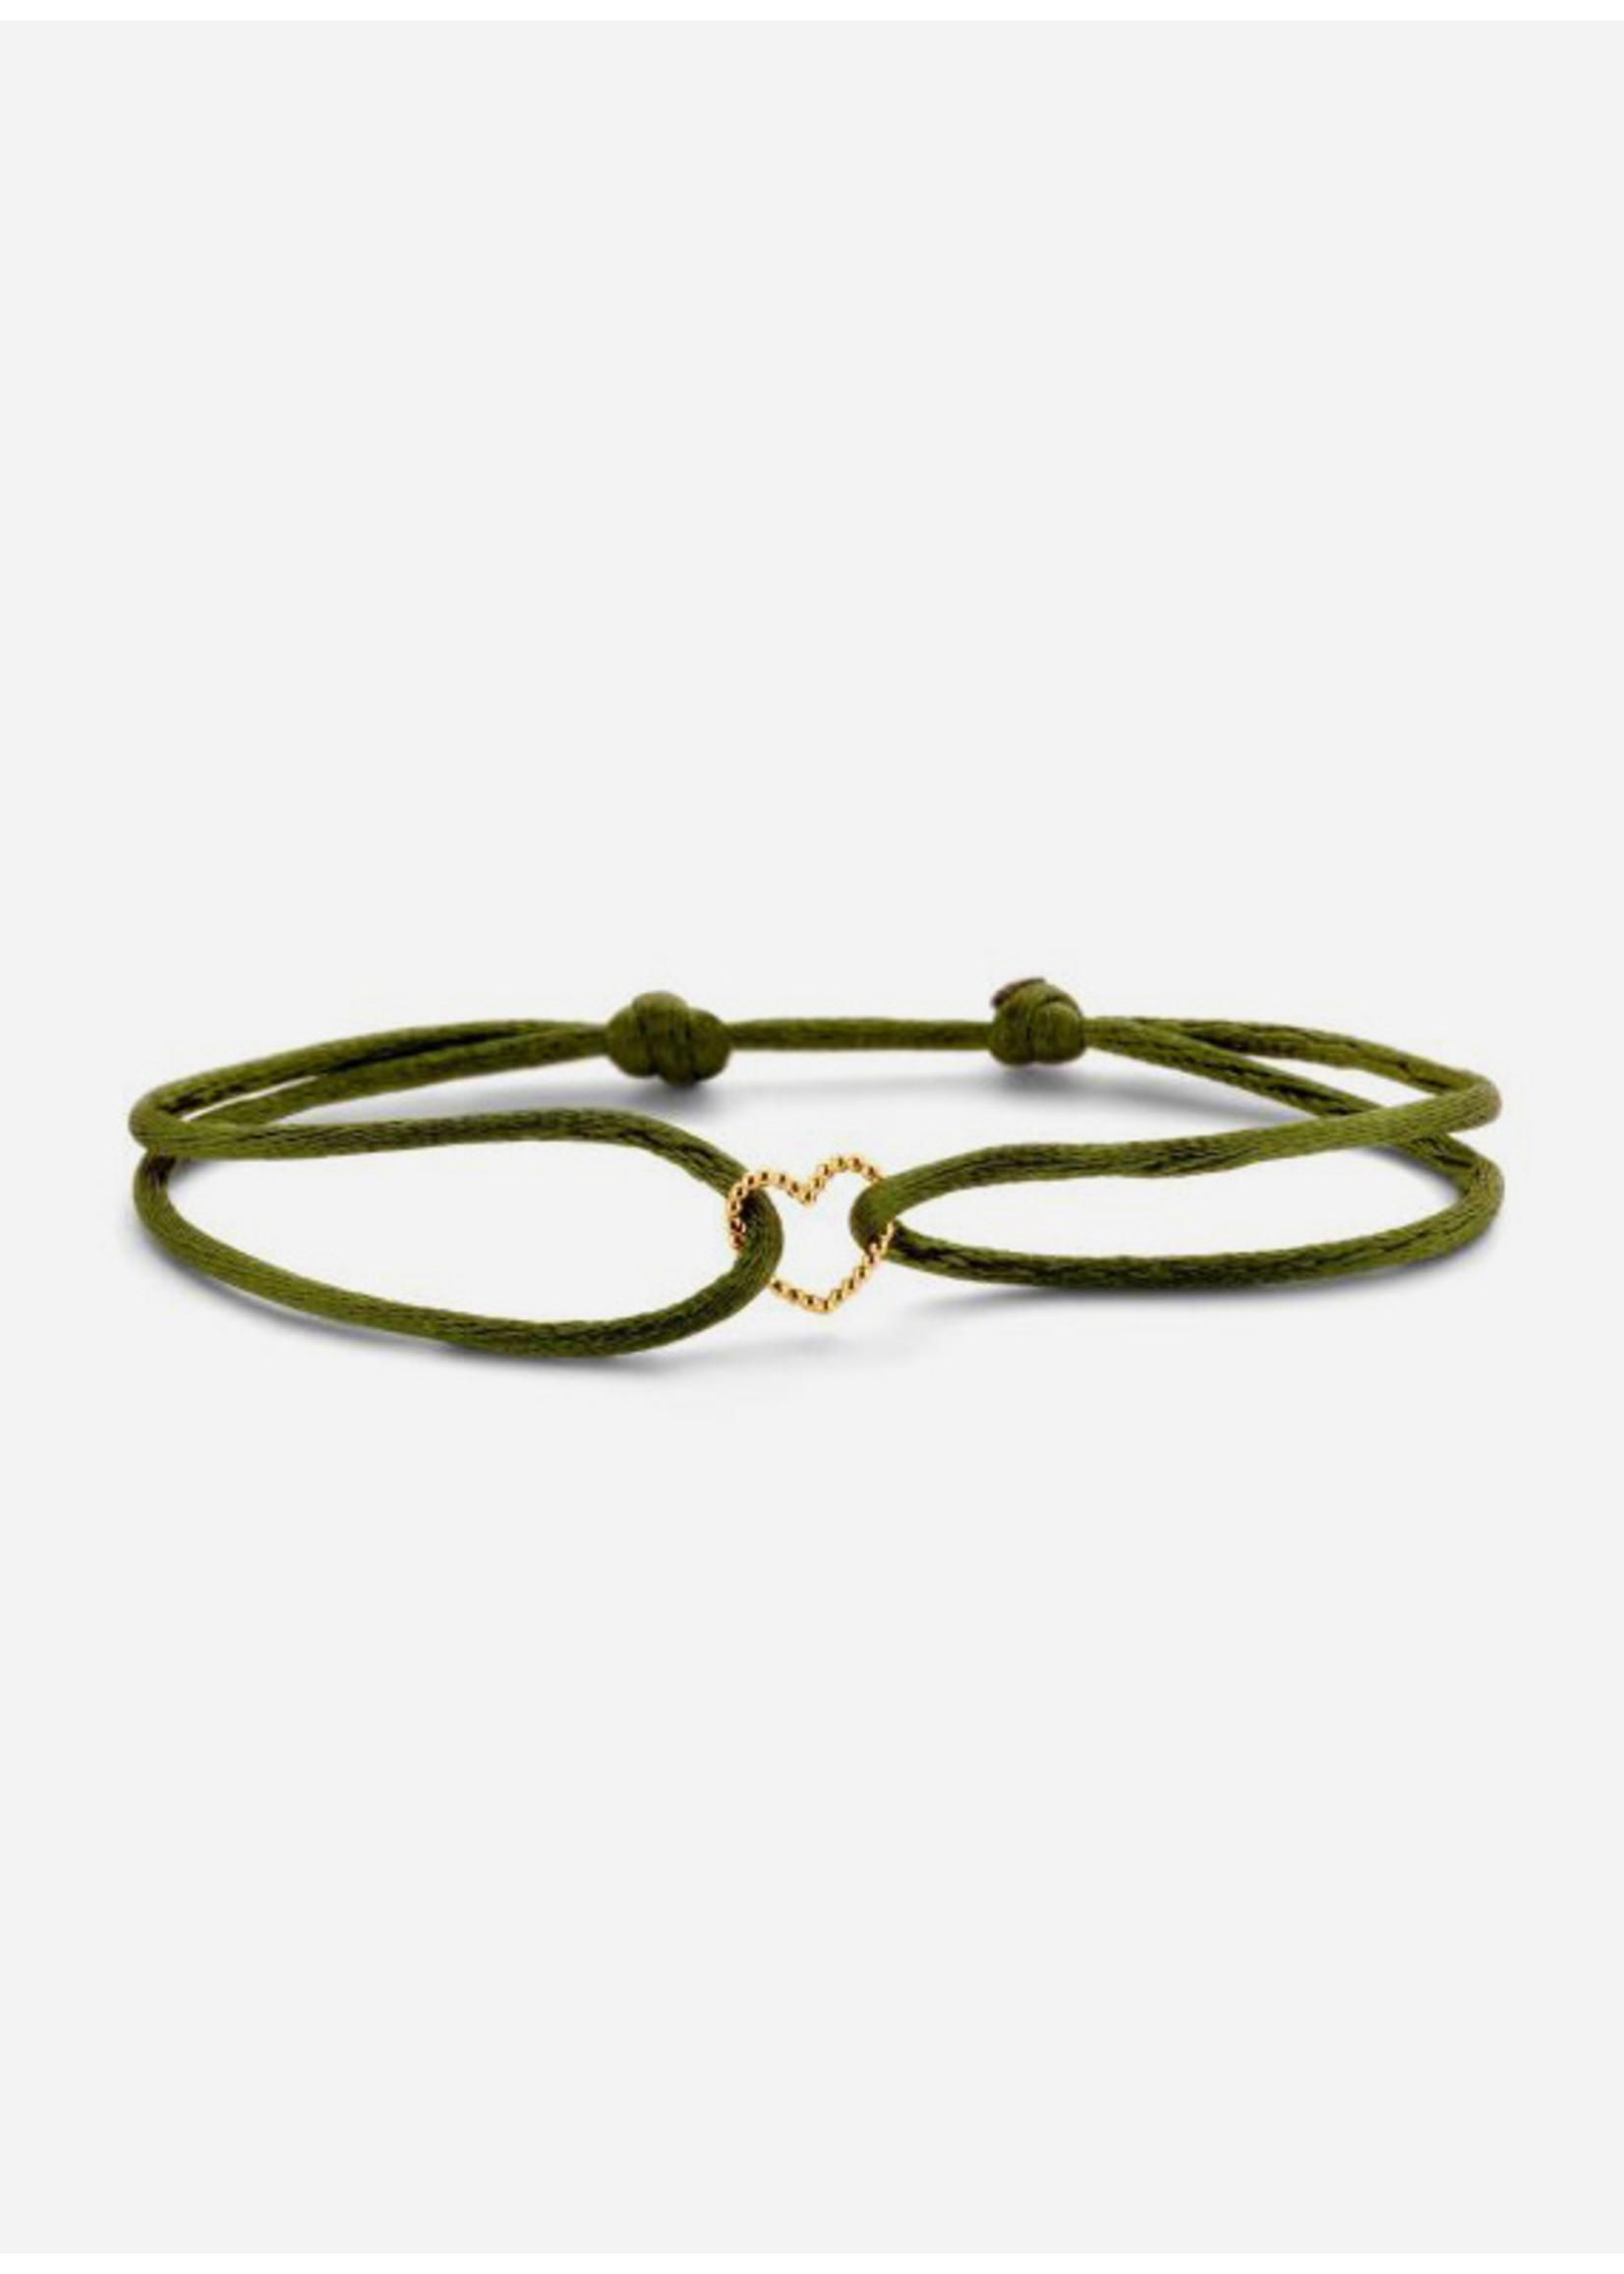 Just Franky Vintage heart bracelet cord